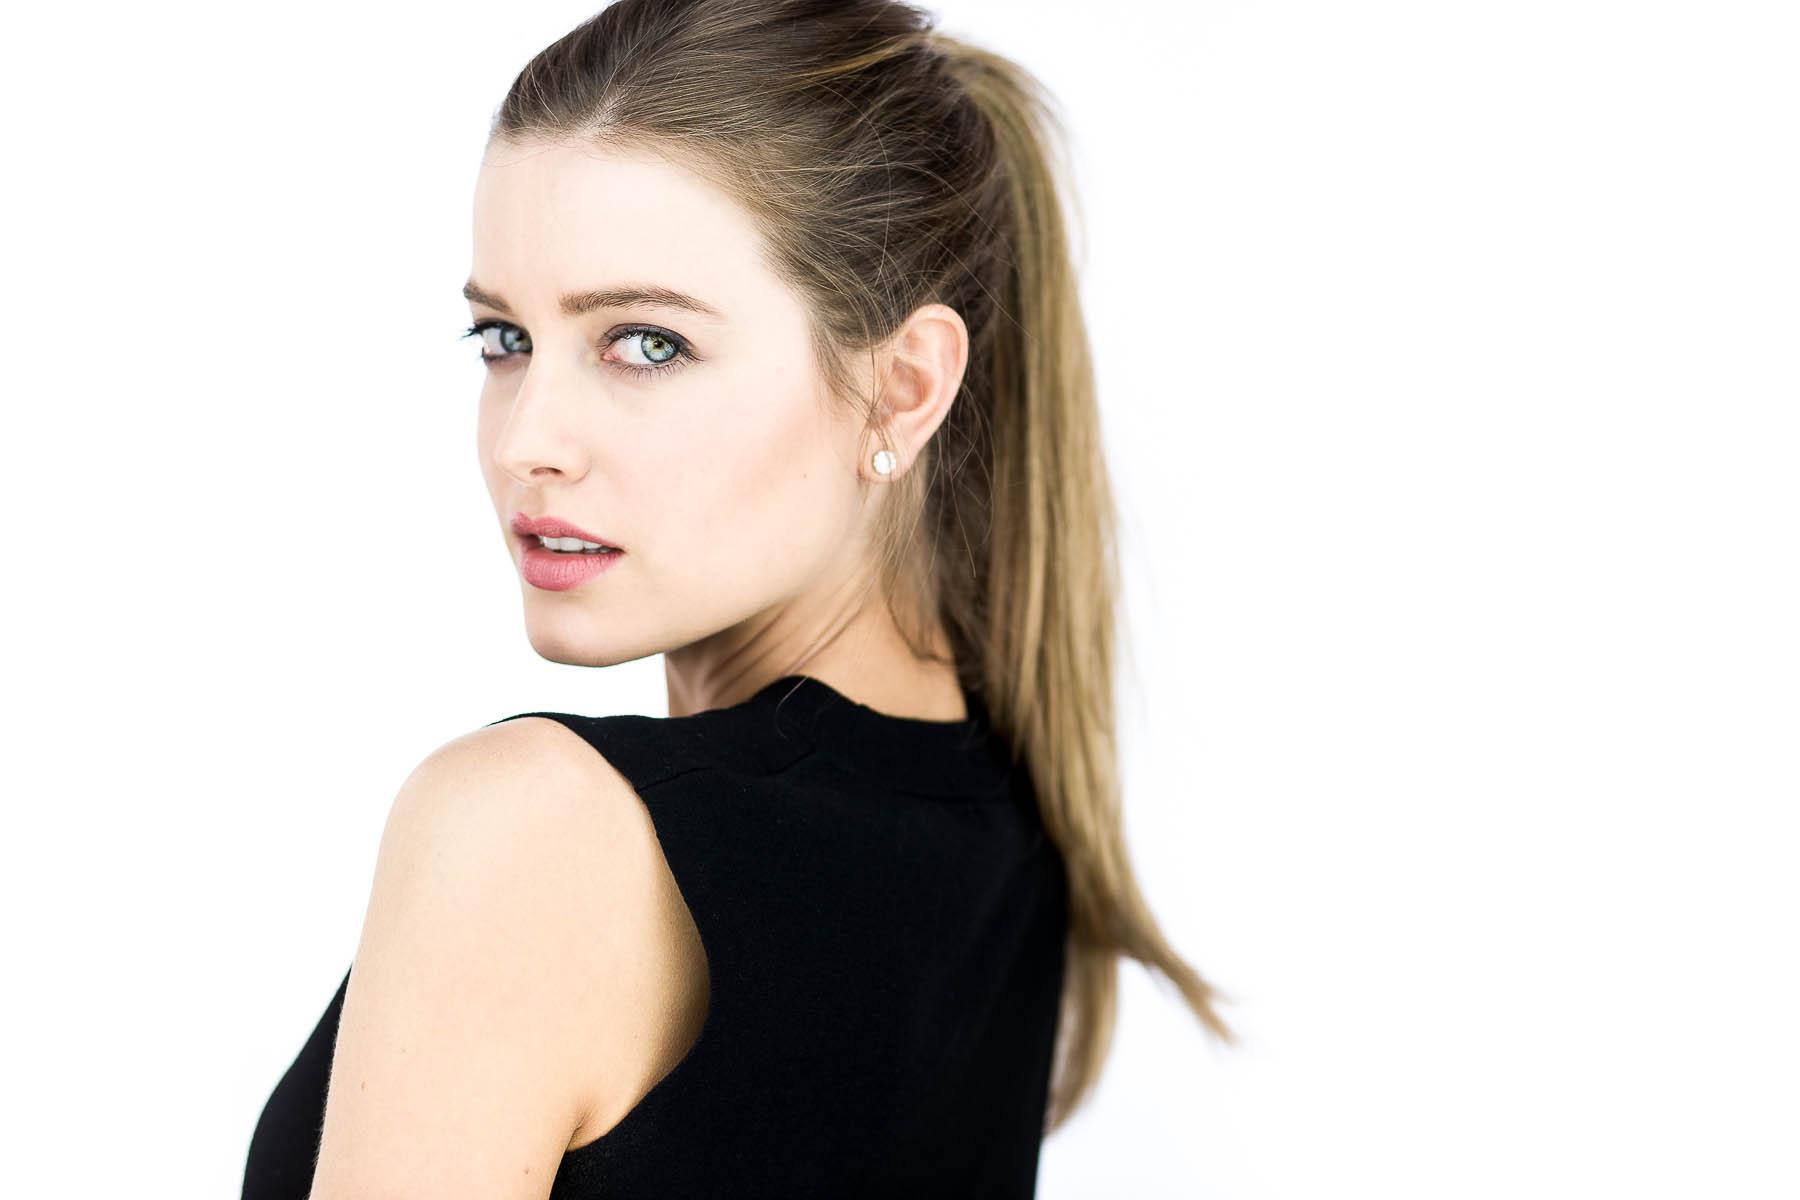 lauren-model-professional-headshots-39.jpg